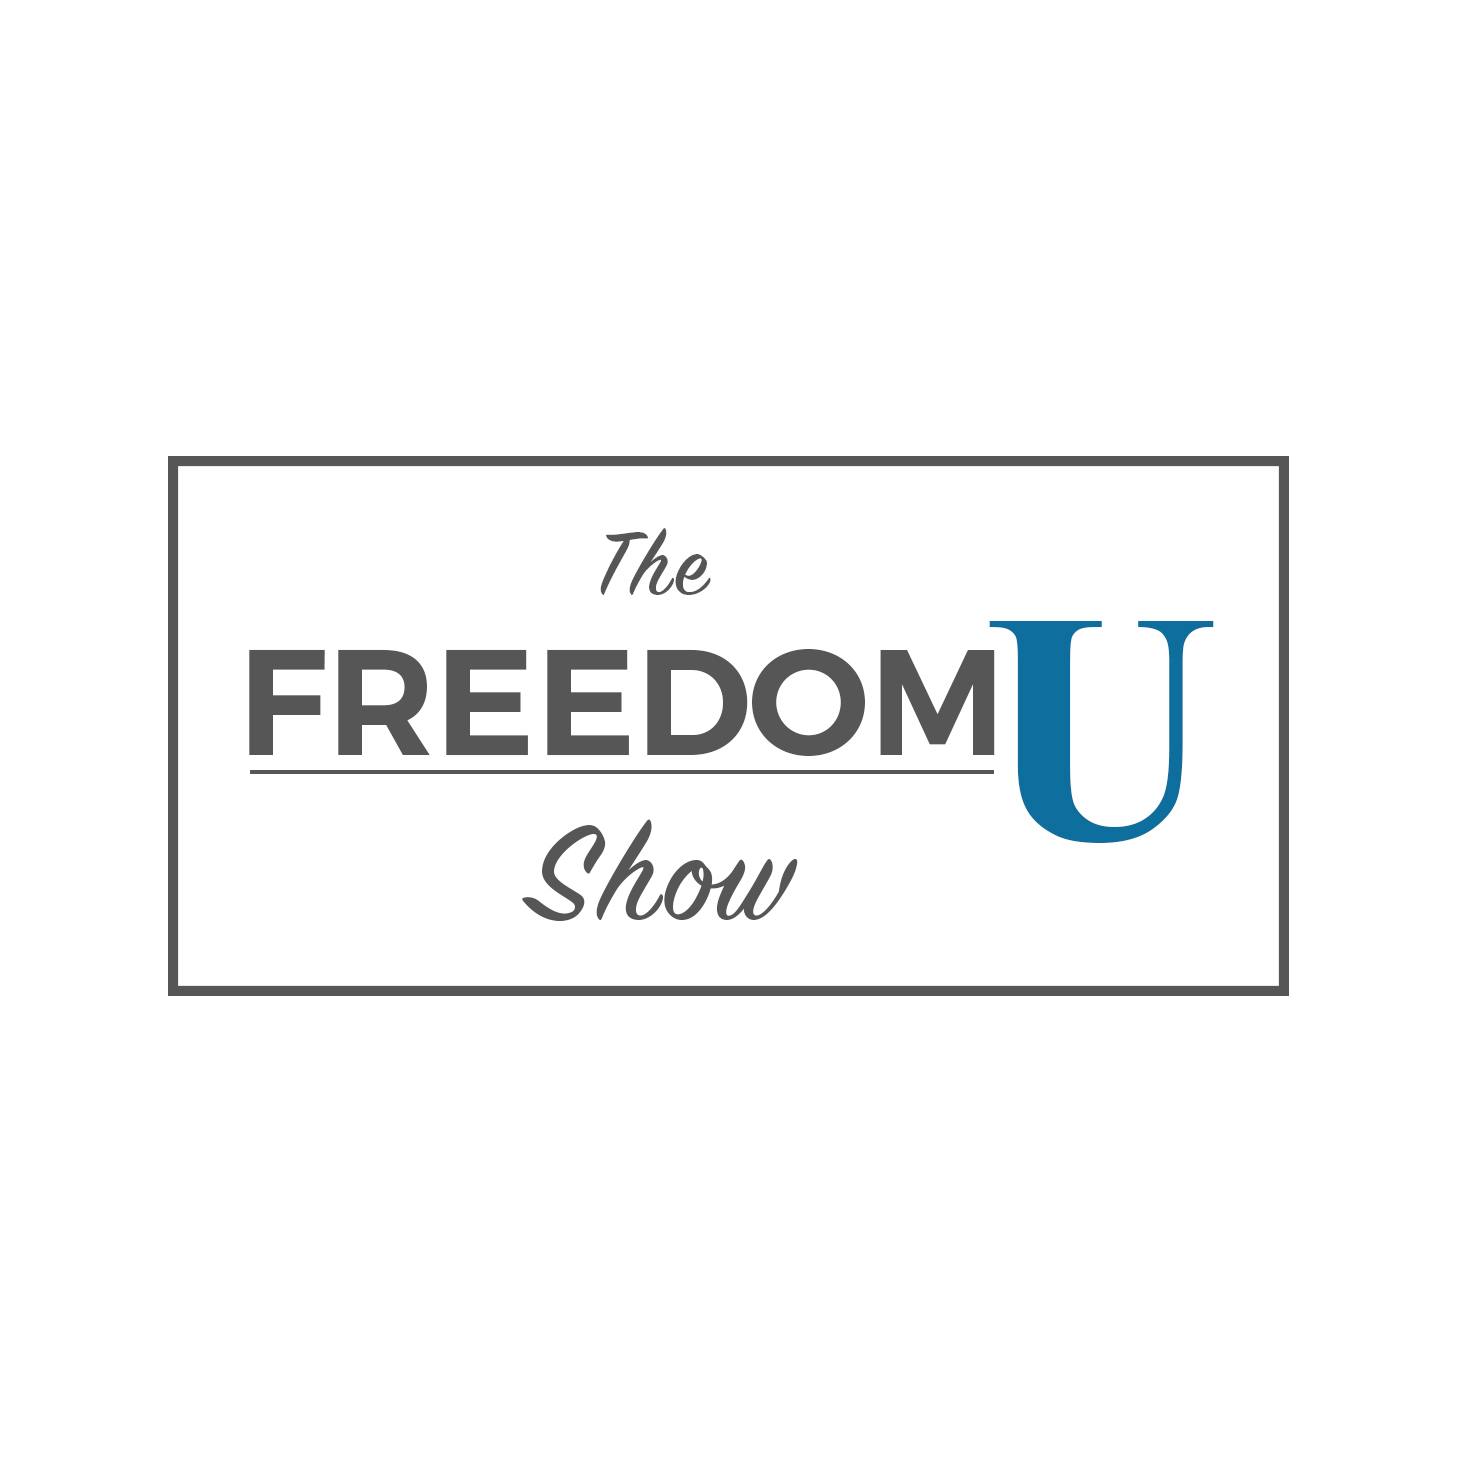 Hollywood: The Marketing of Sex Addiction.Freedom U Sexual Wellness Recovery Institute. www.freedomu.net